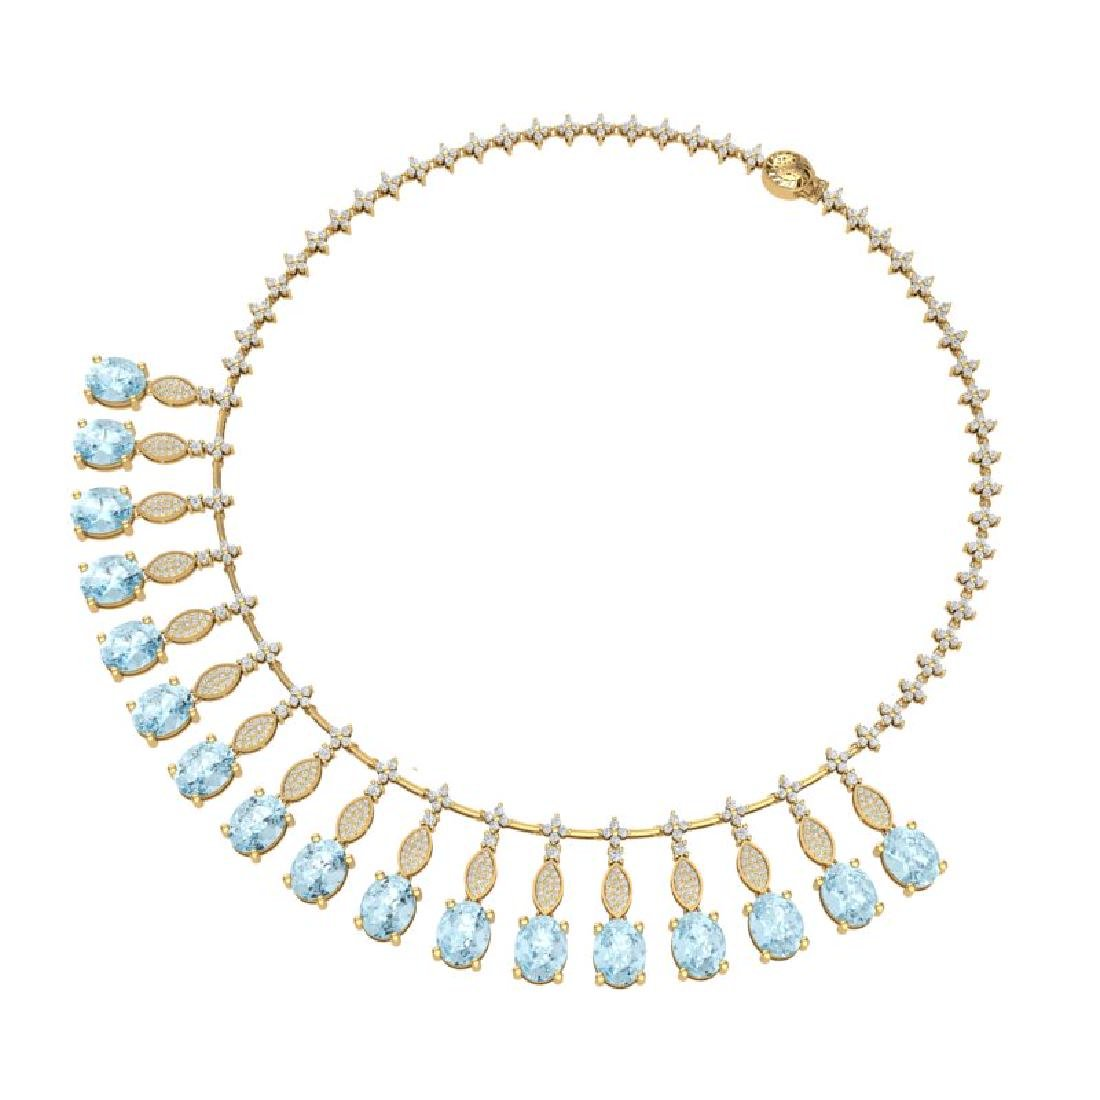 65.76 CTW Royalty Sky Topaz & VS Diamond Necklace 18K - 3